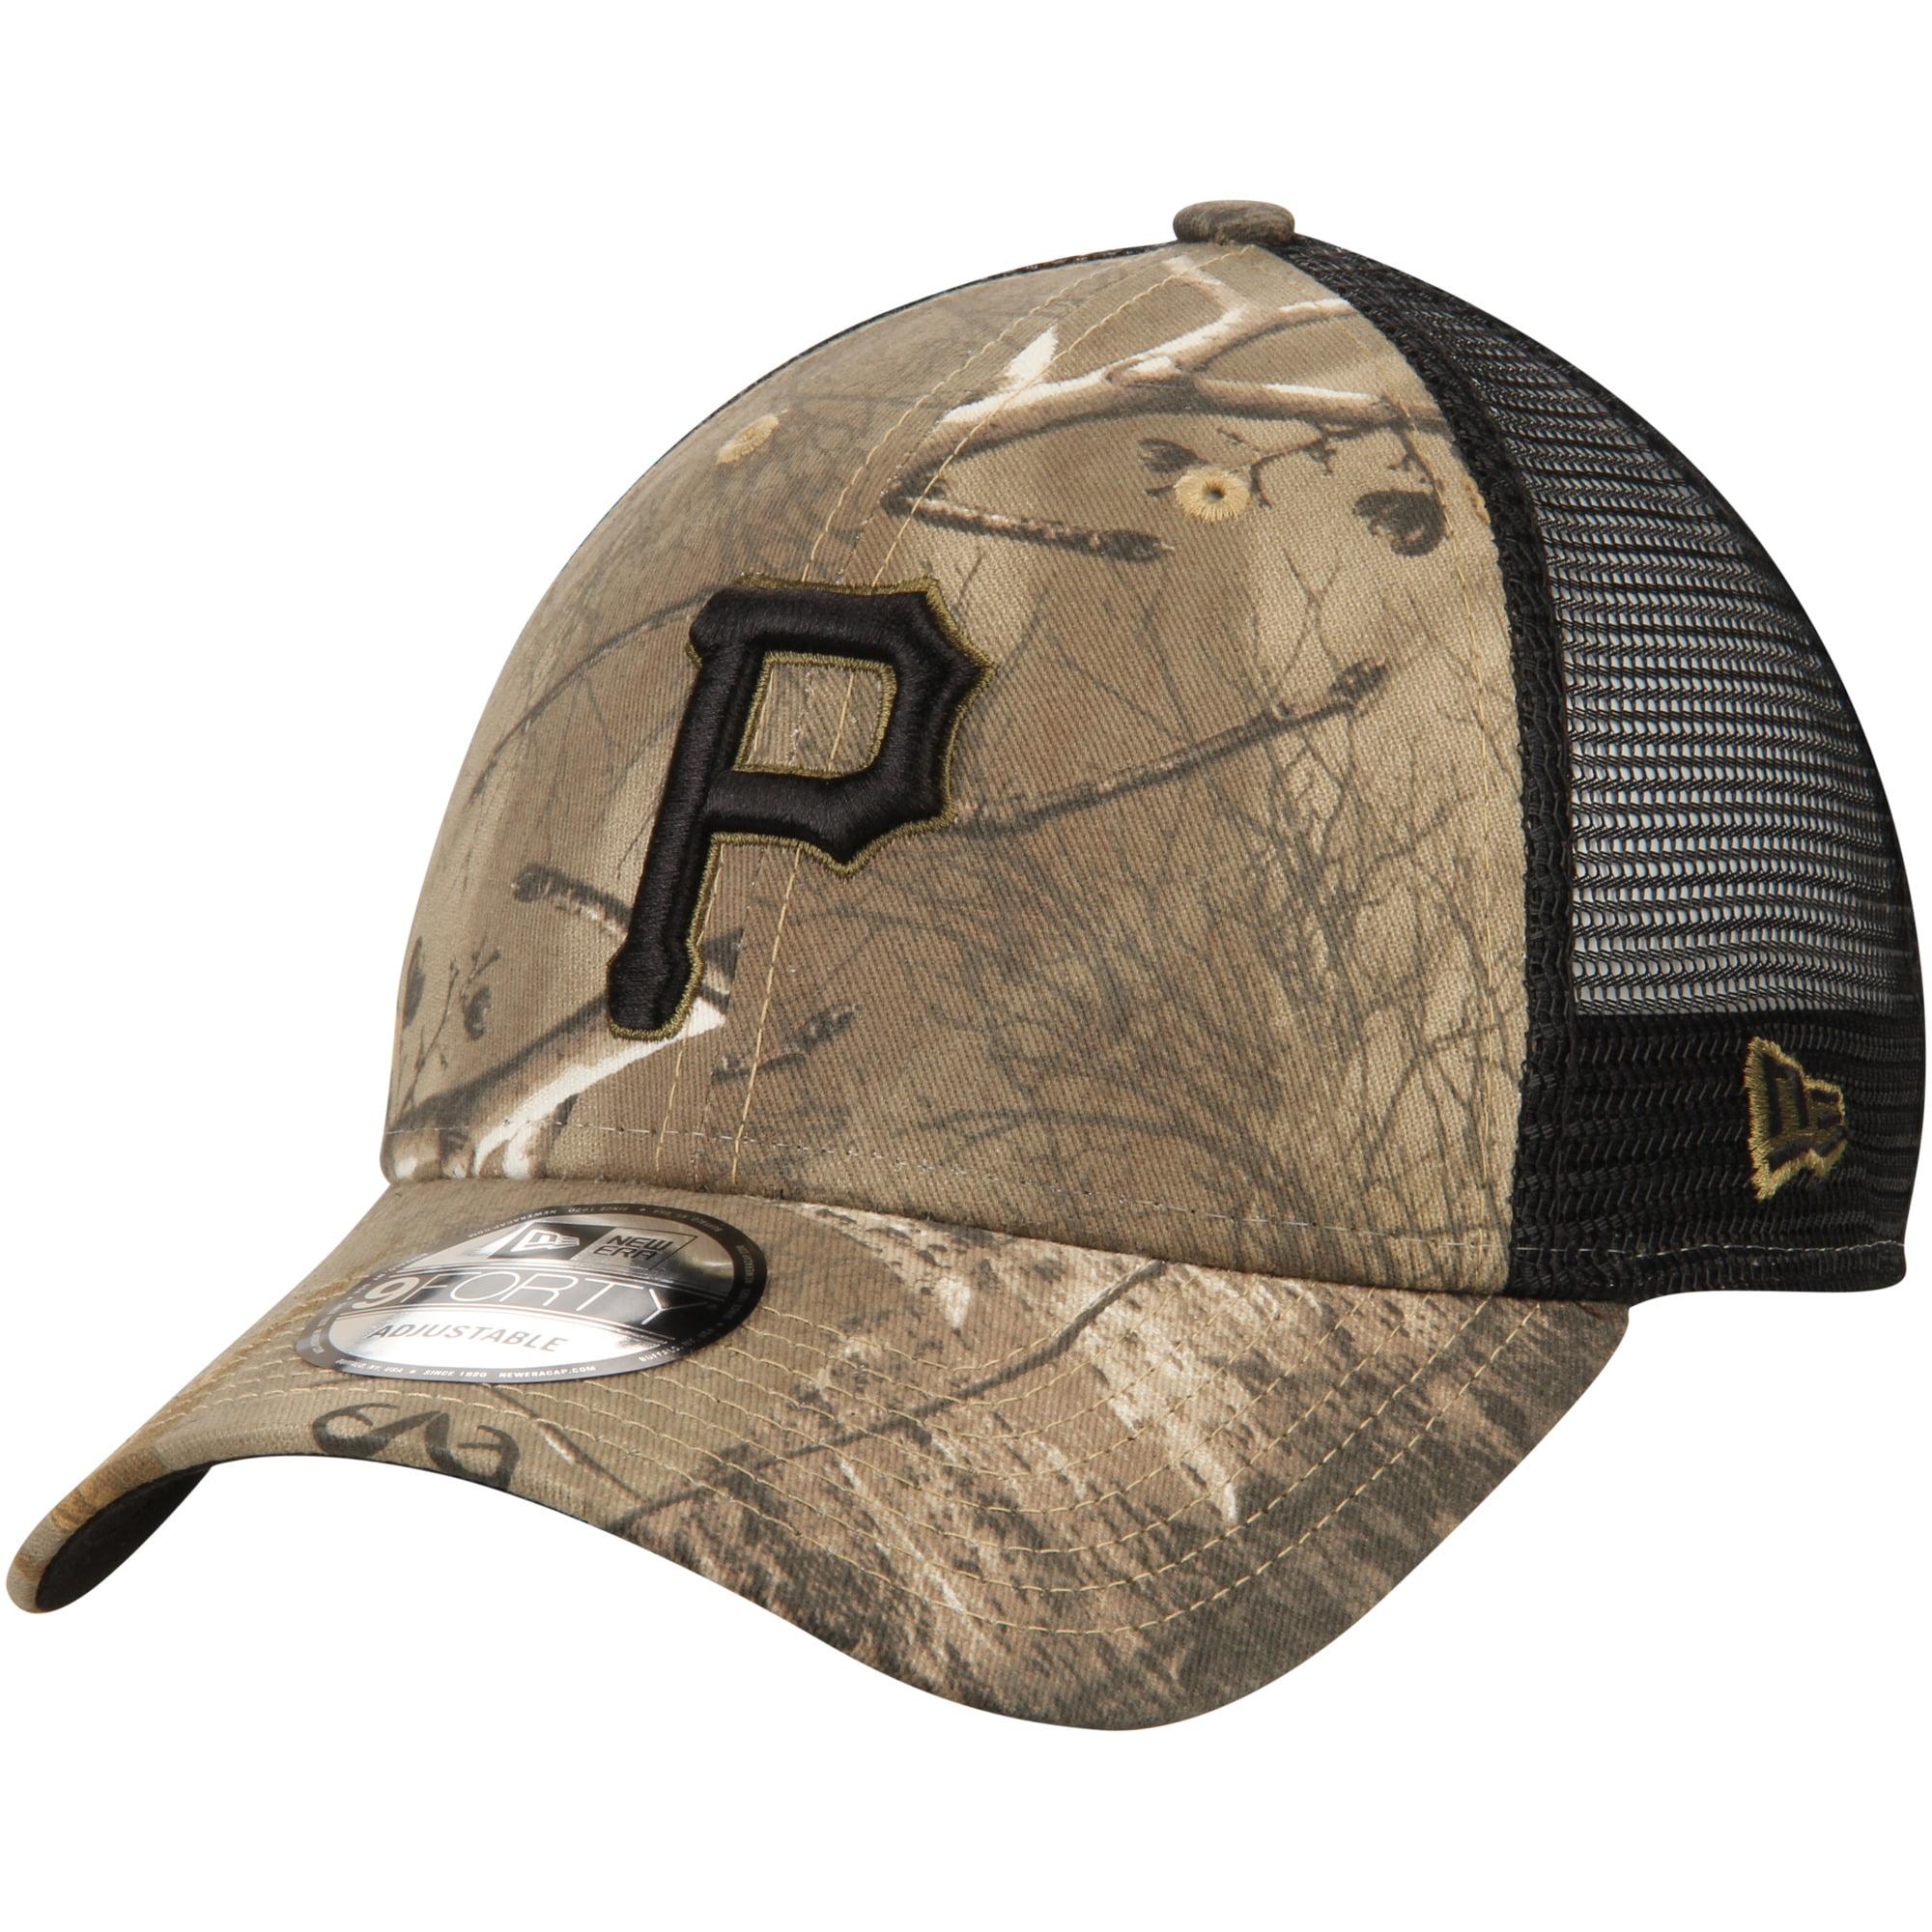 Pittsburgh Pirates New Era Realtree Trucker 9FORTY Adjustable Snapback Hat - Camo/Black - OSFA